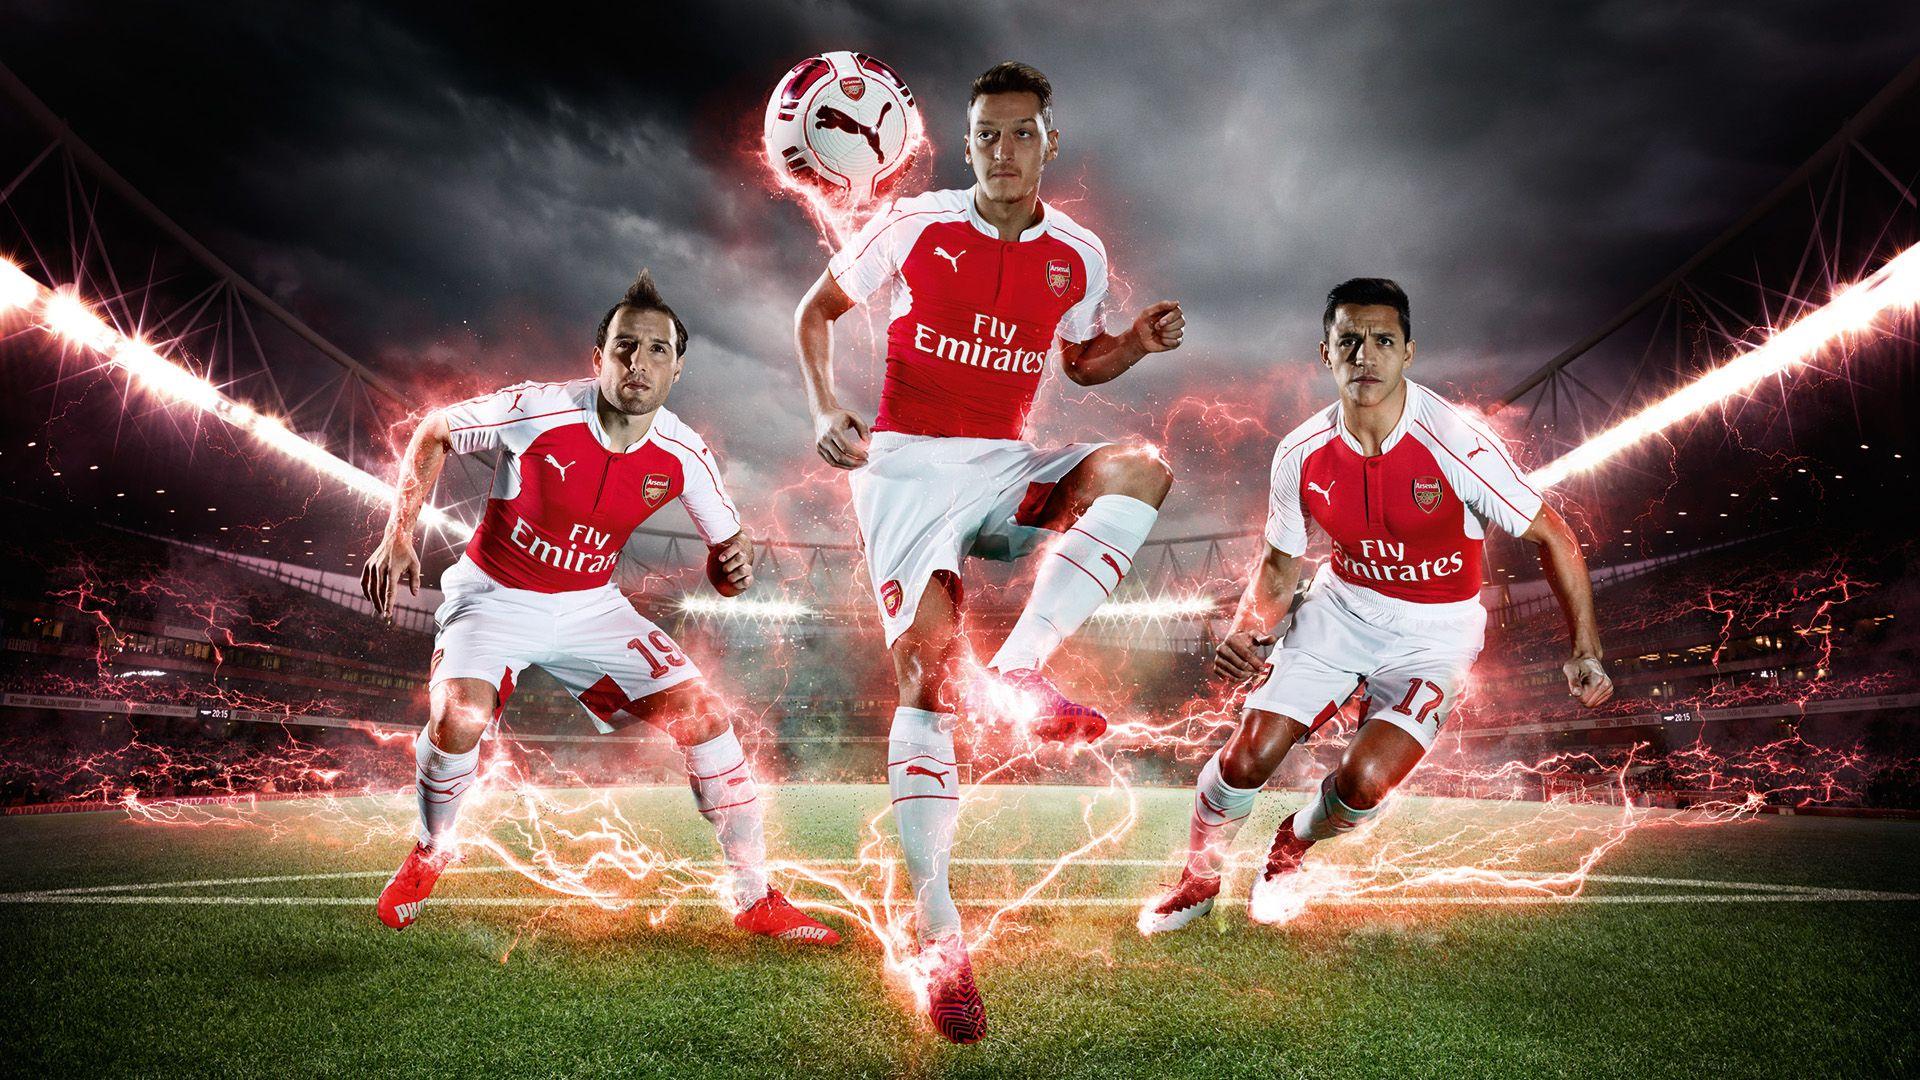 Arsenal Wallpapers HD 2018 1920x1080